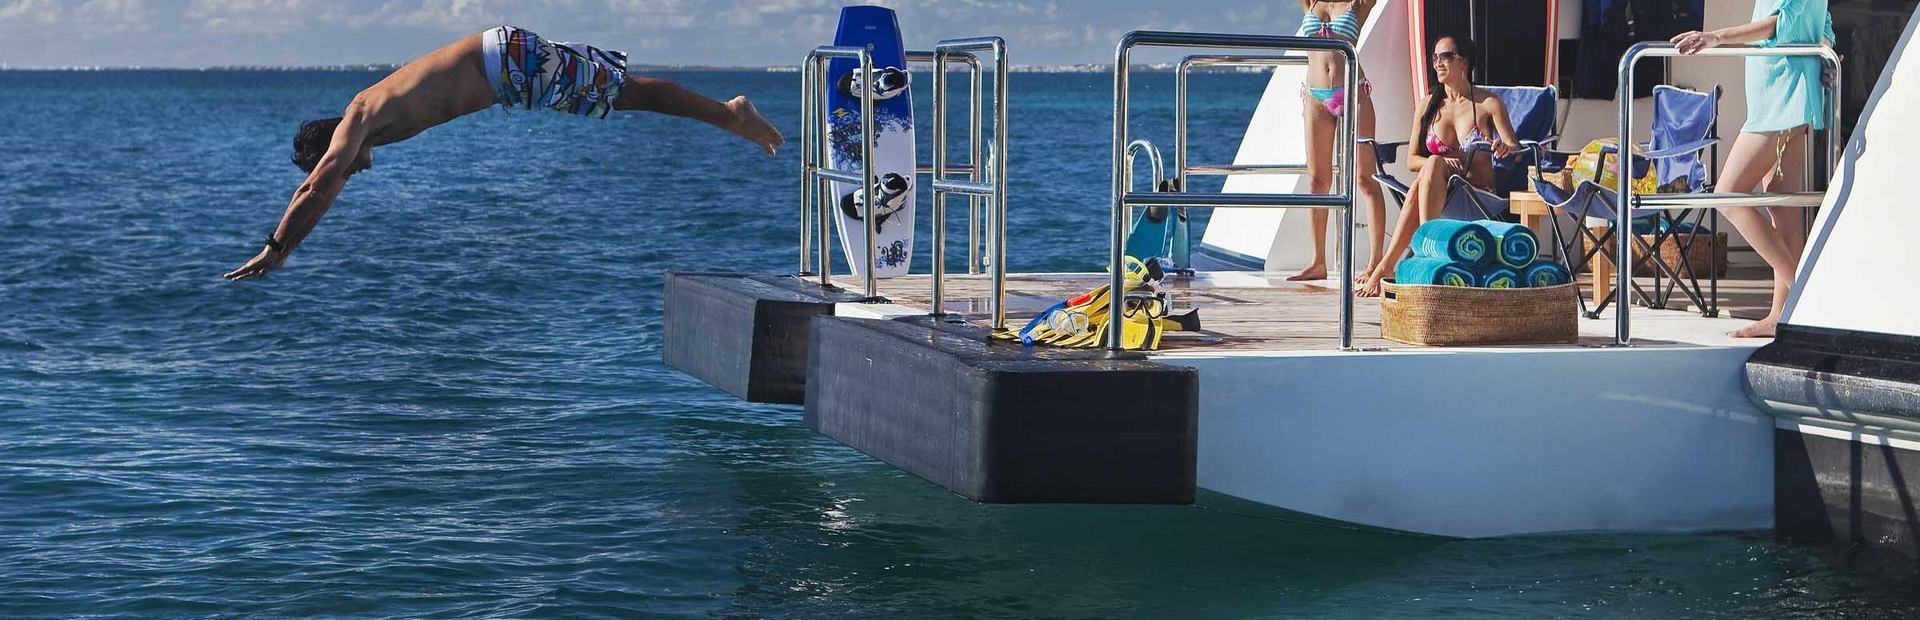 Charter guest diving off swim platform of Jaguar Superyacht